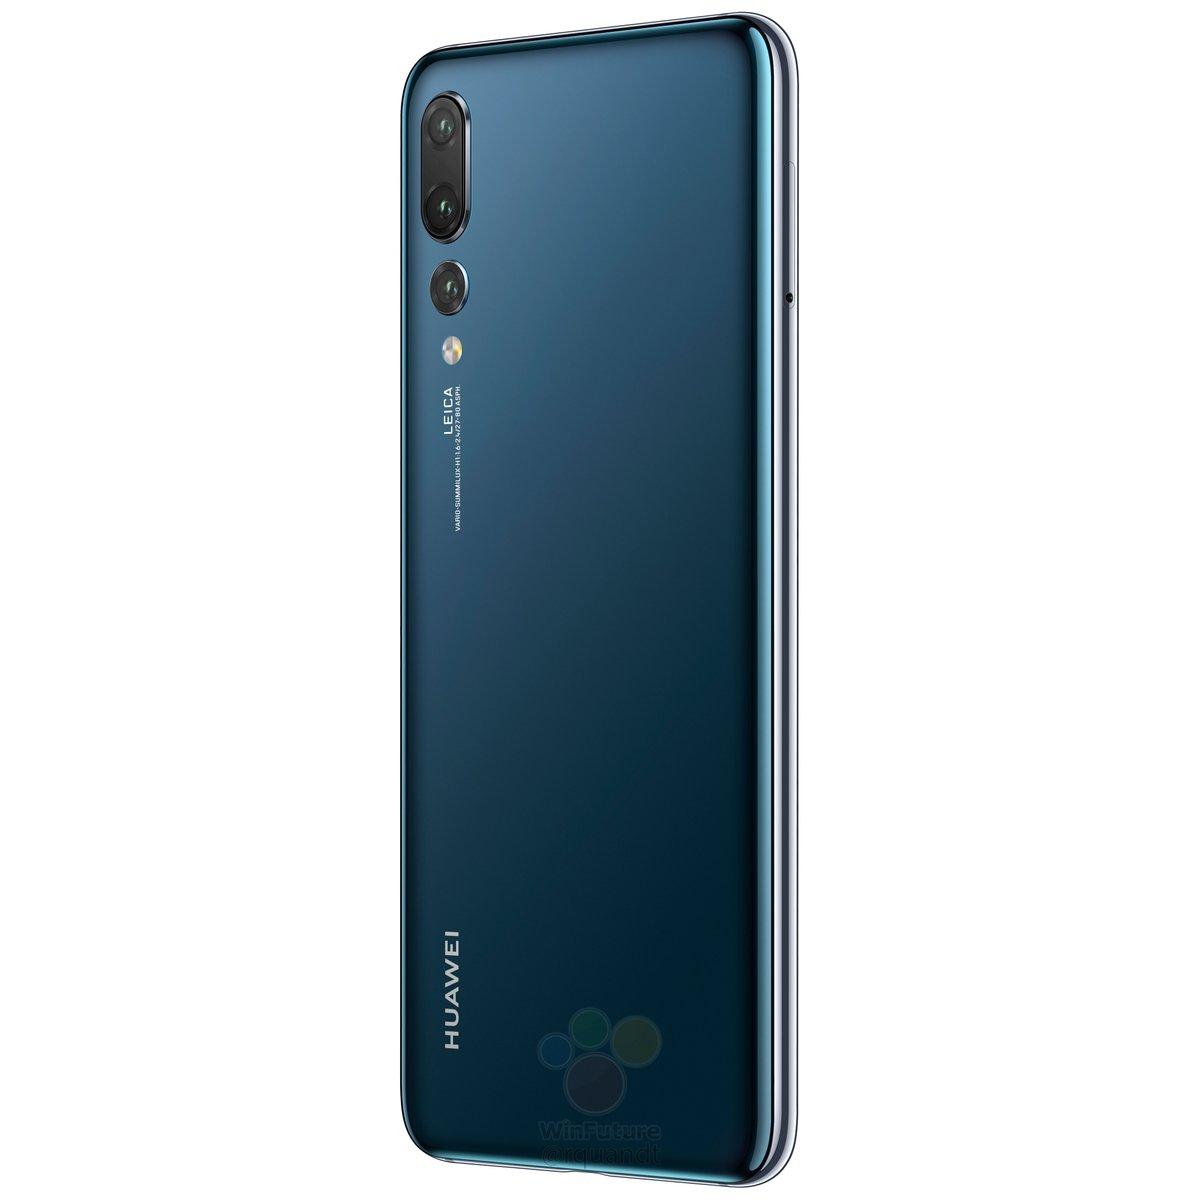 Huawei-P20-Pro-9